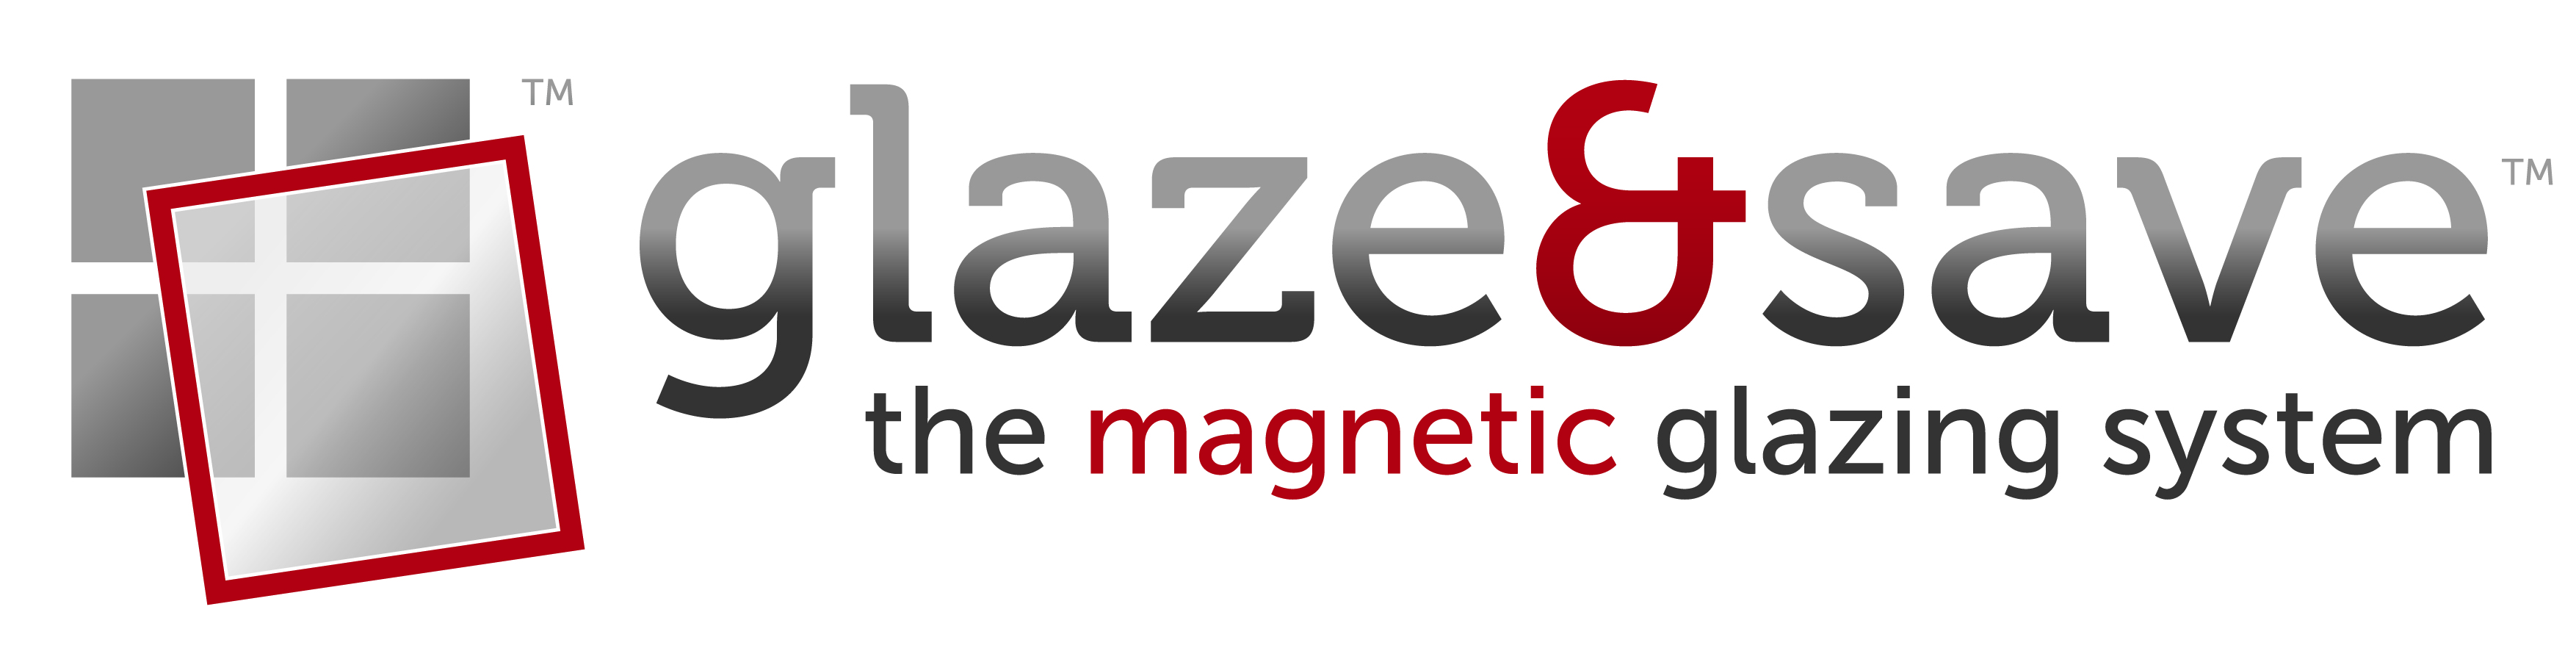 Glaze___Save_Logo_-_CYMK-01.jpeg